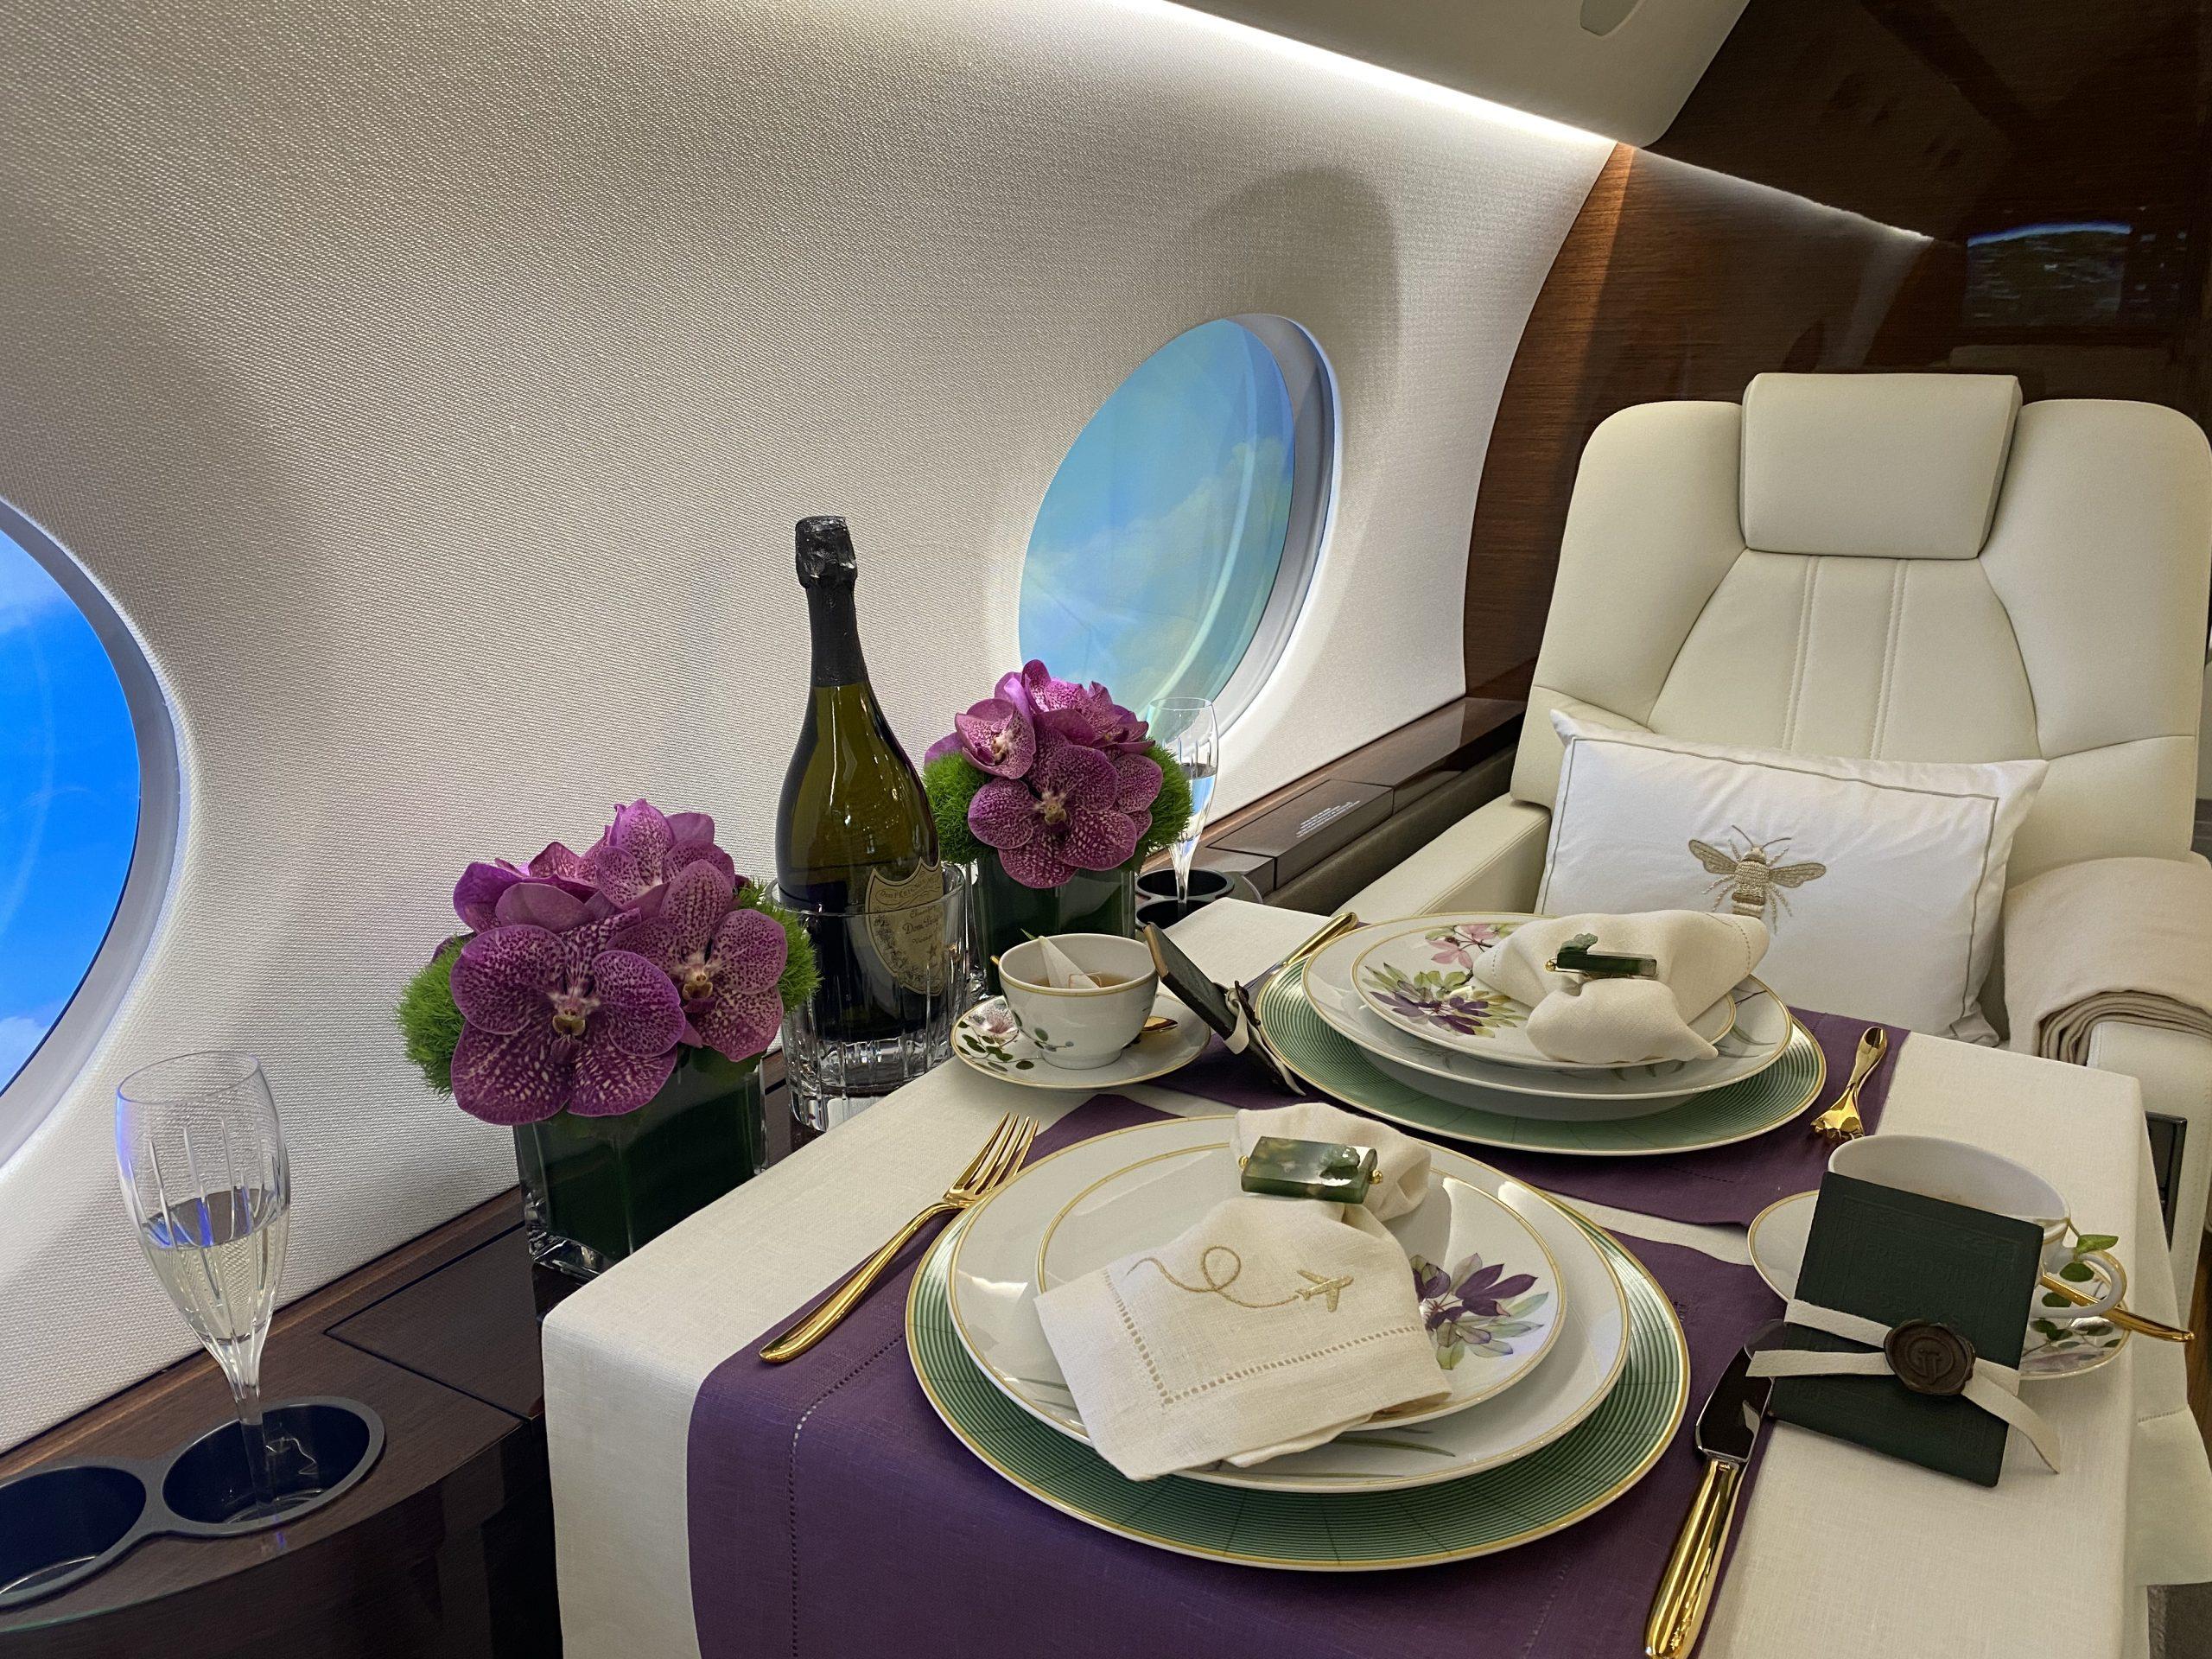 International Jet Interiors Summer Soiree at 40,000 Feet Featuring Bernardaud, SFERRA and Christofle